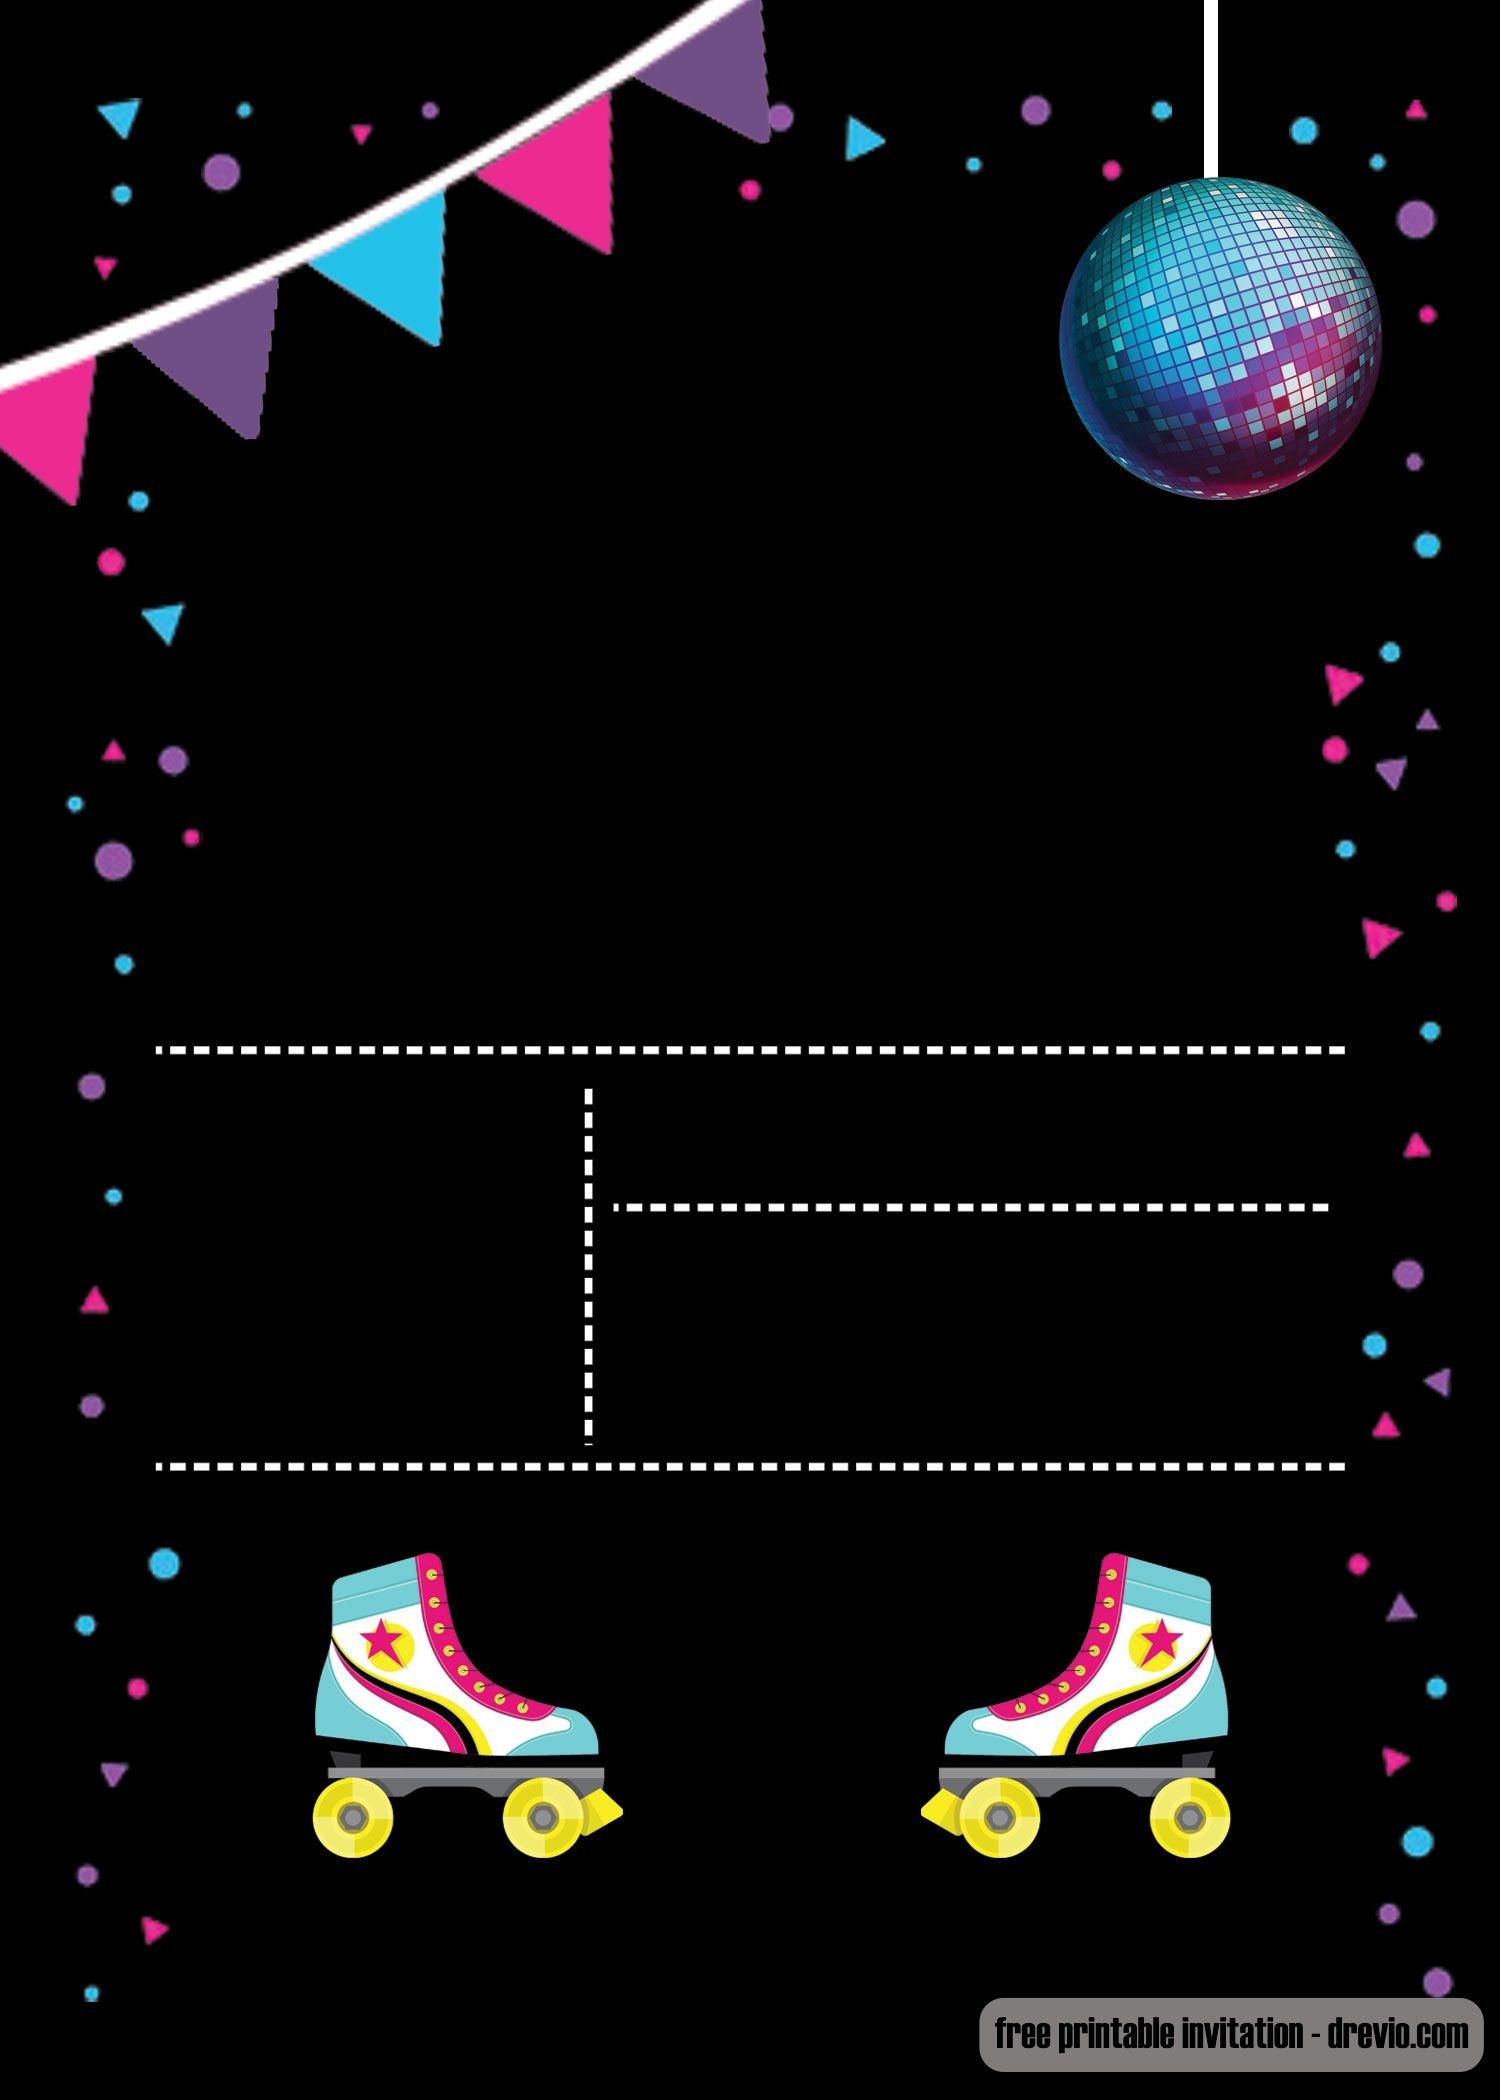 Free Printable Roller Skating Invitation | Invites | Birthday - Free Printable Skateboard Birthday Party Invitations